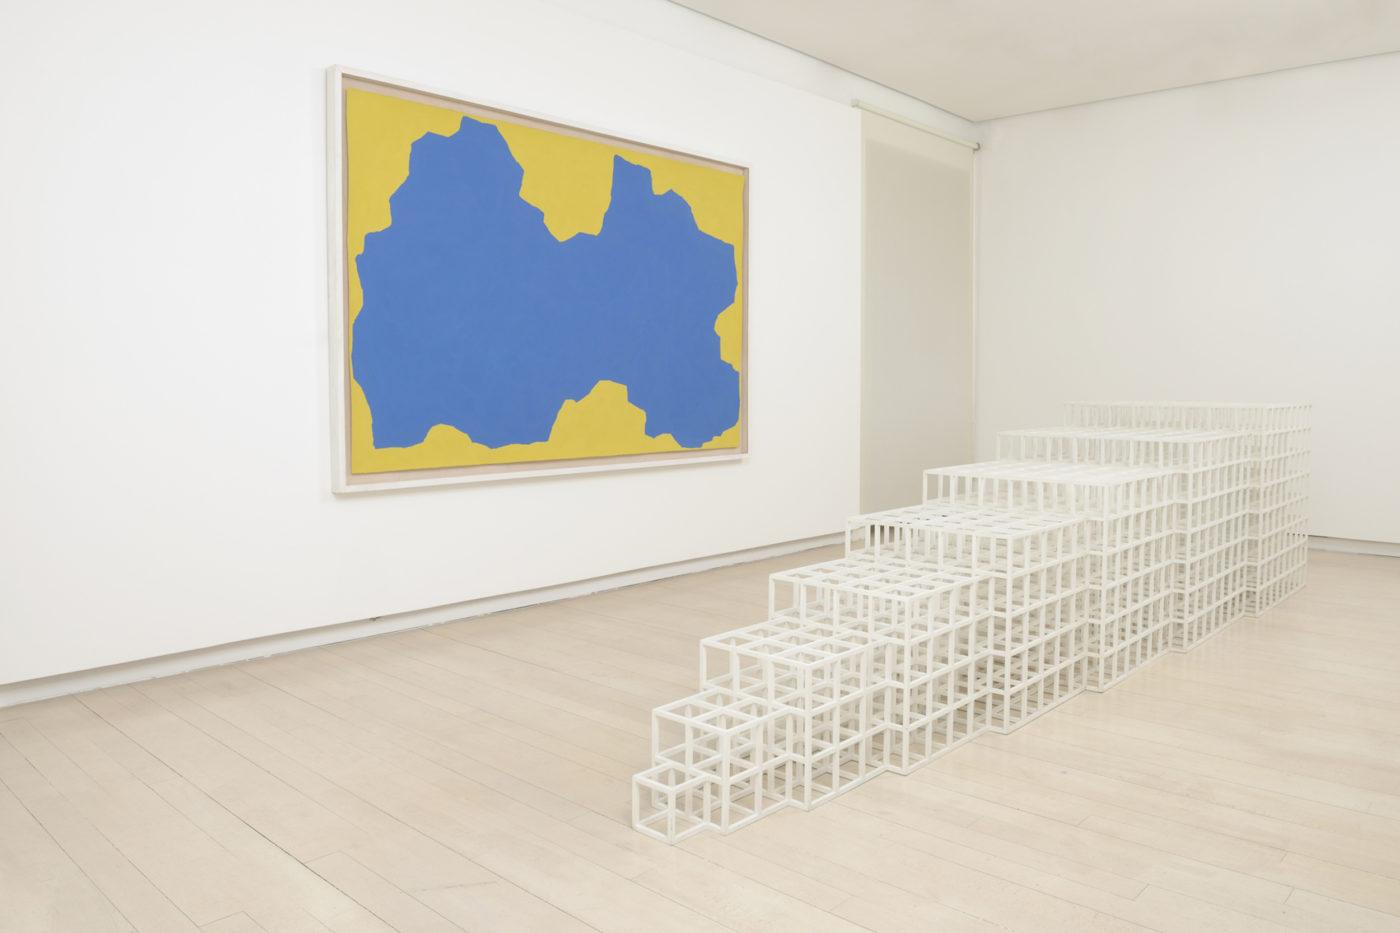 Sol Lewitt vistas de Exposición, 2015 Galería Elvira González